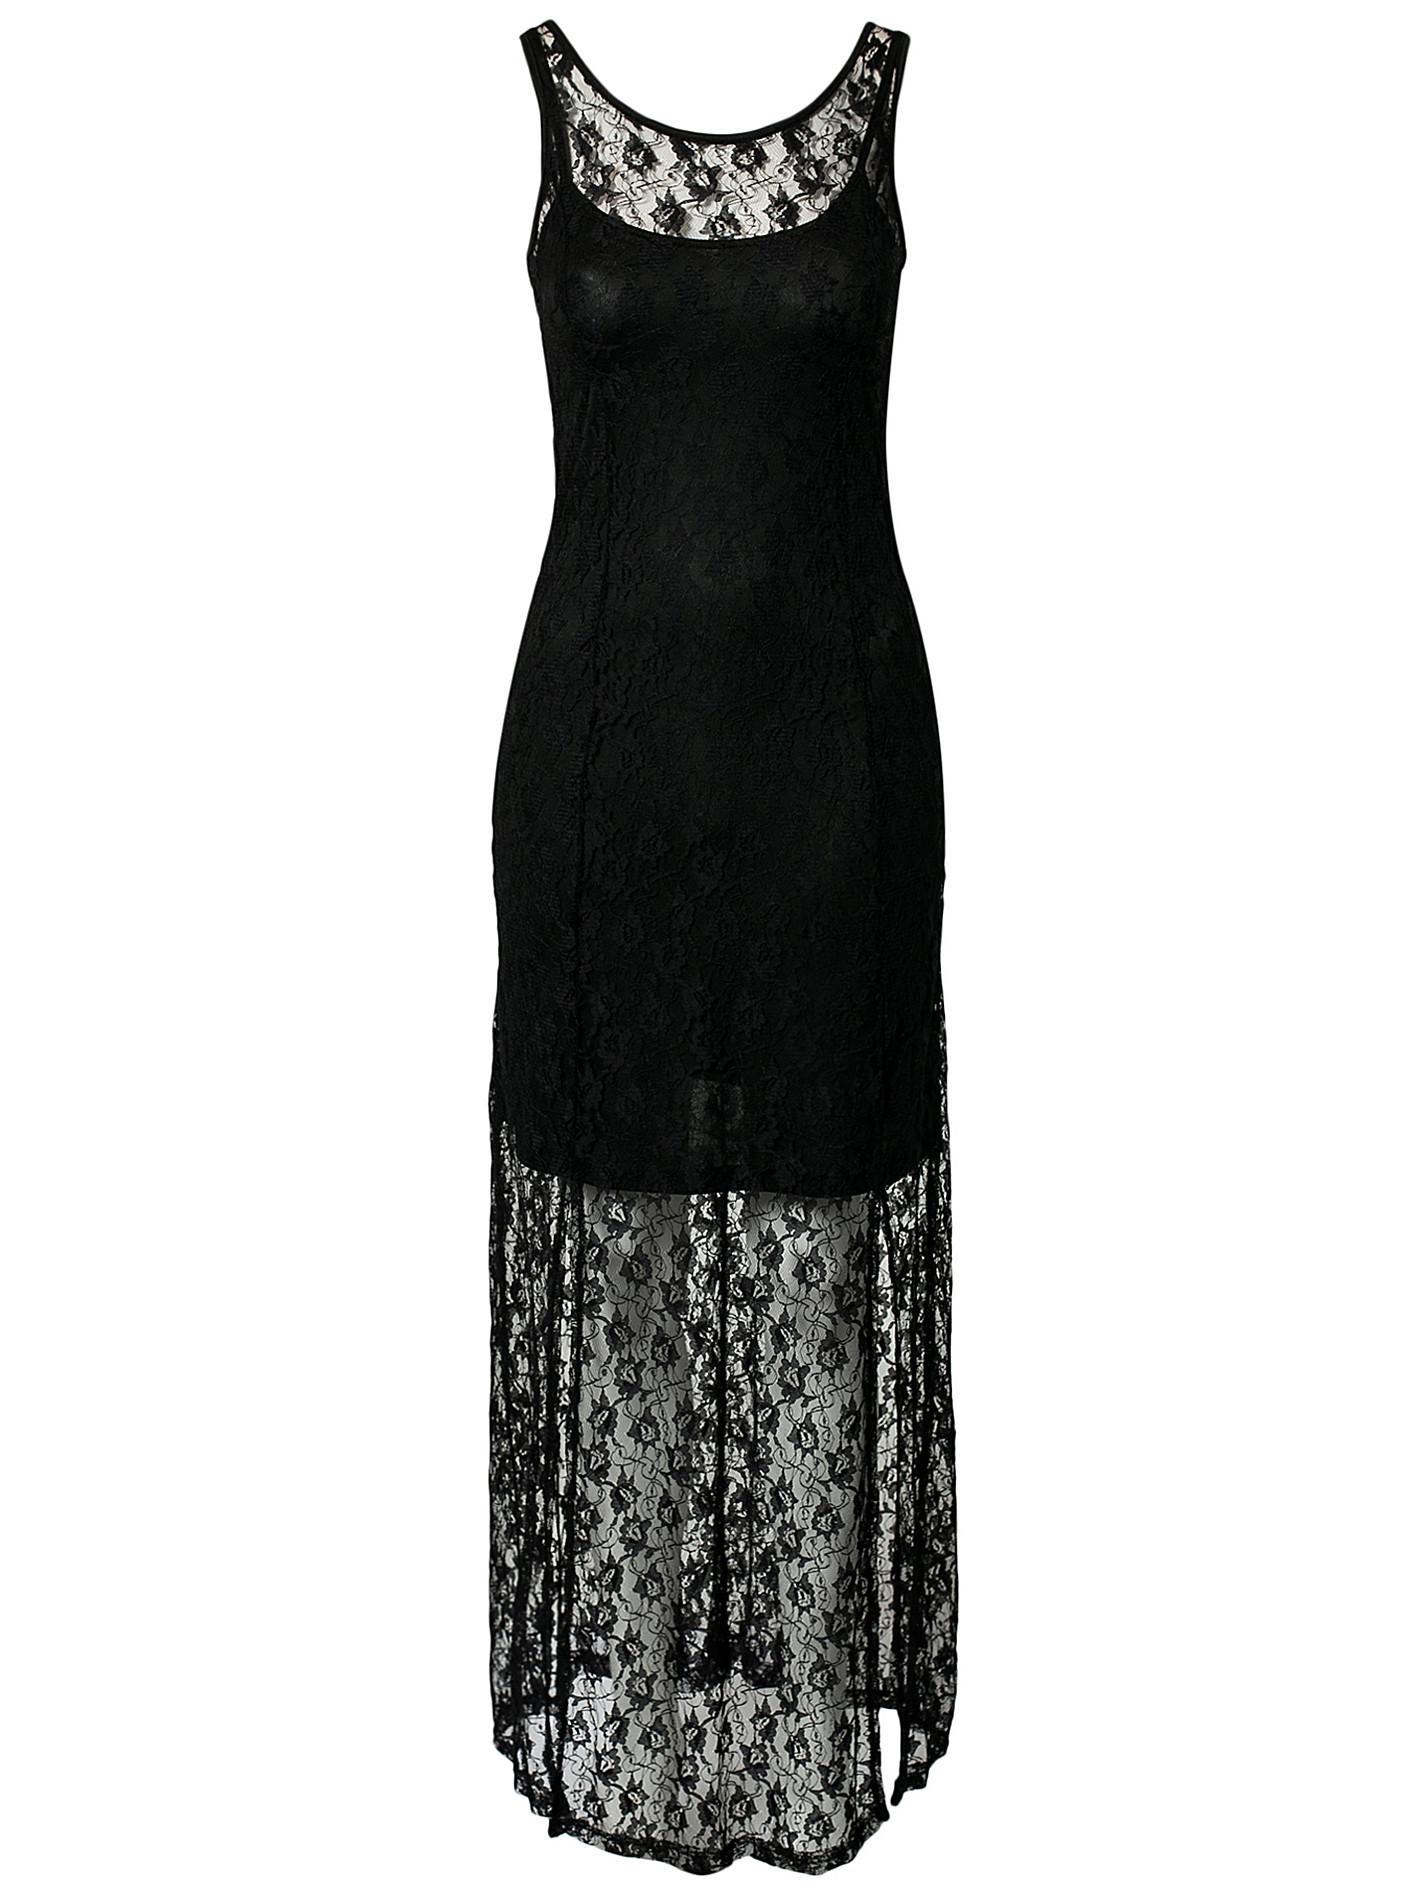 dec4739914c8d فستان دانتيل طويل أسود